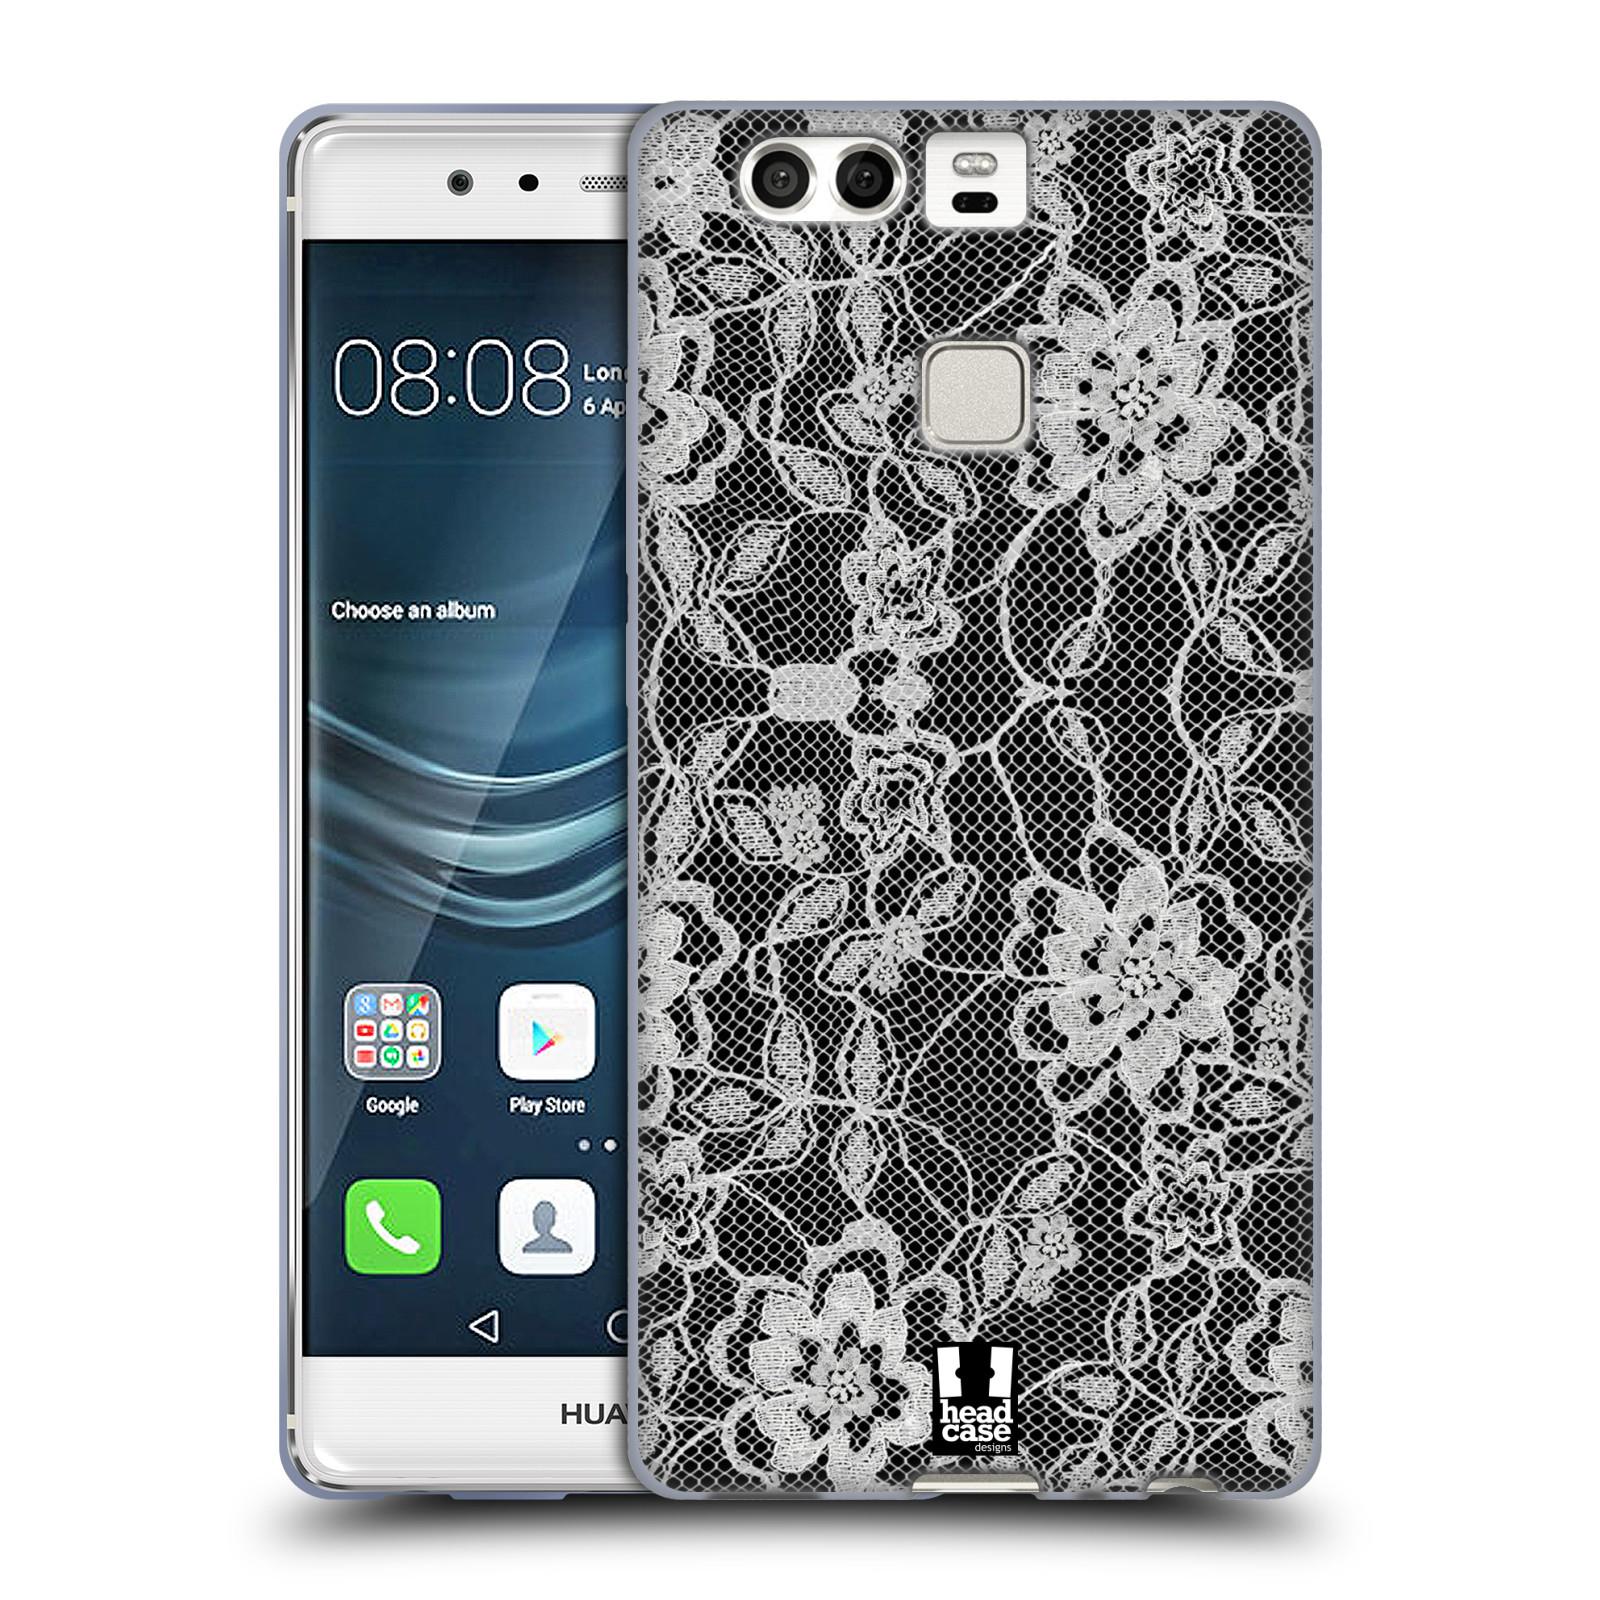 Silikonové pouzdro na mobil Huawei P9 HEAD CASE FLOWERY KRAJKA (Silikonový kryt či obal na mobilní telefon Huawei P9)